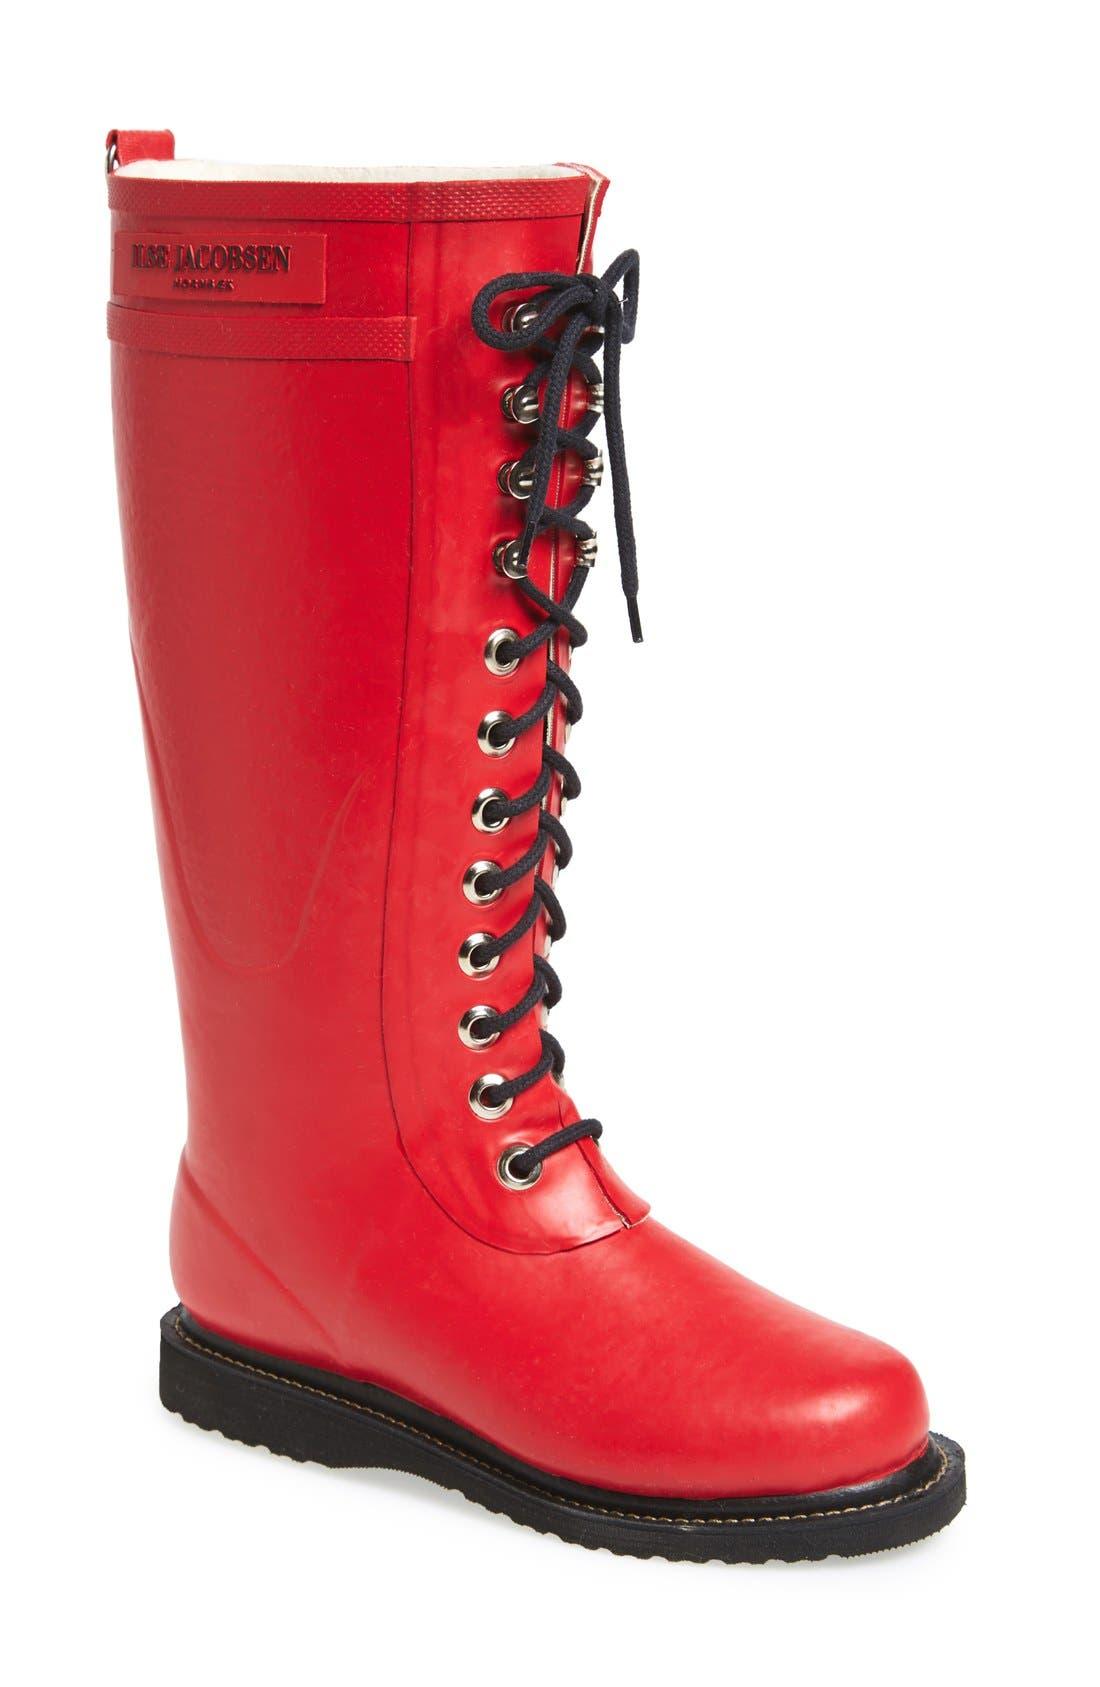 Ilse Jacobsen Rubber Boot, Red